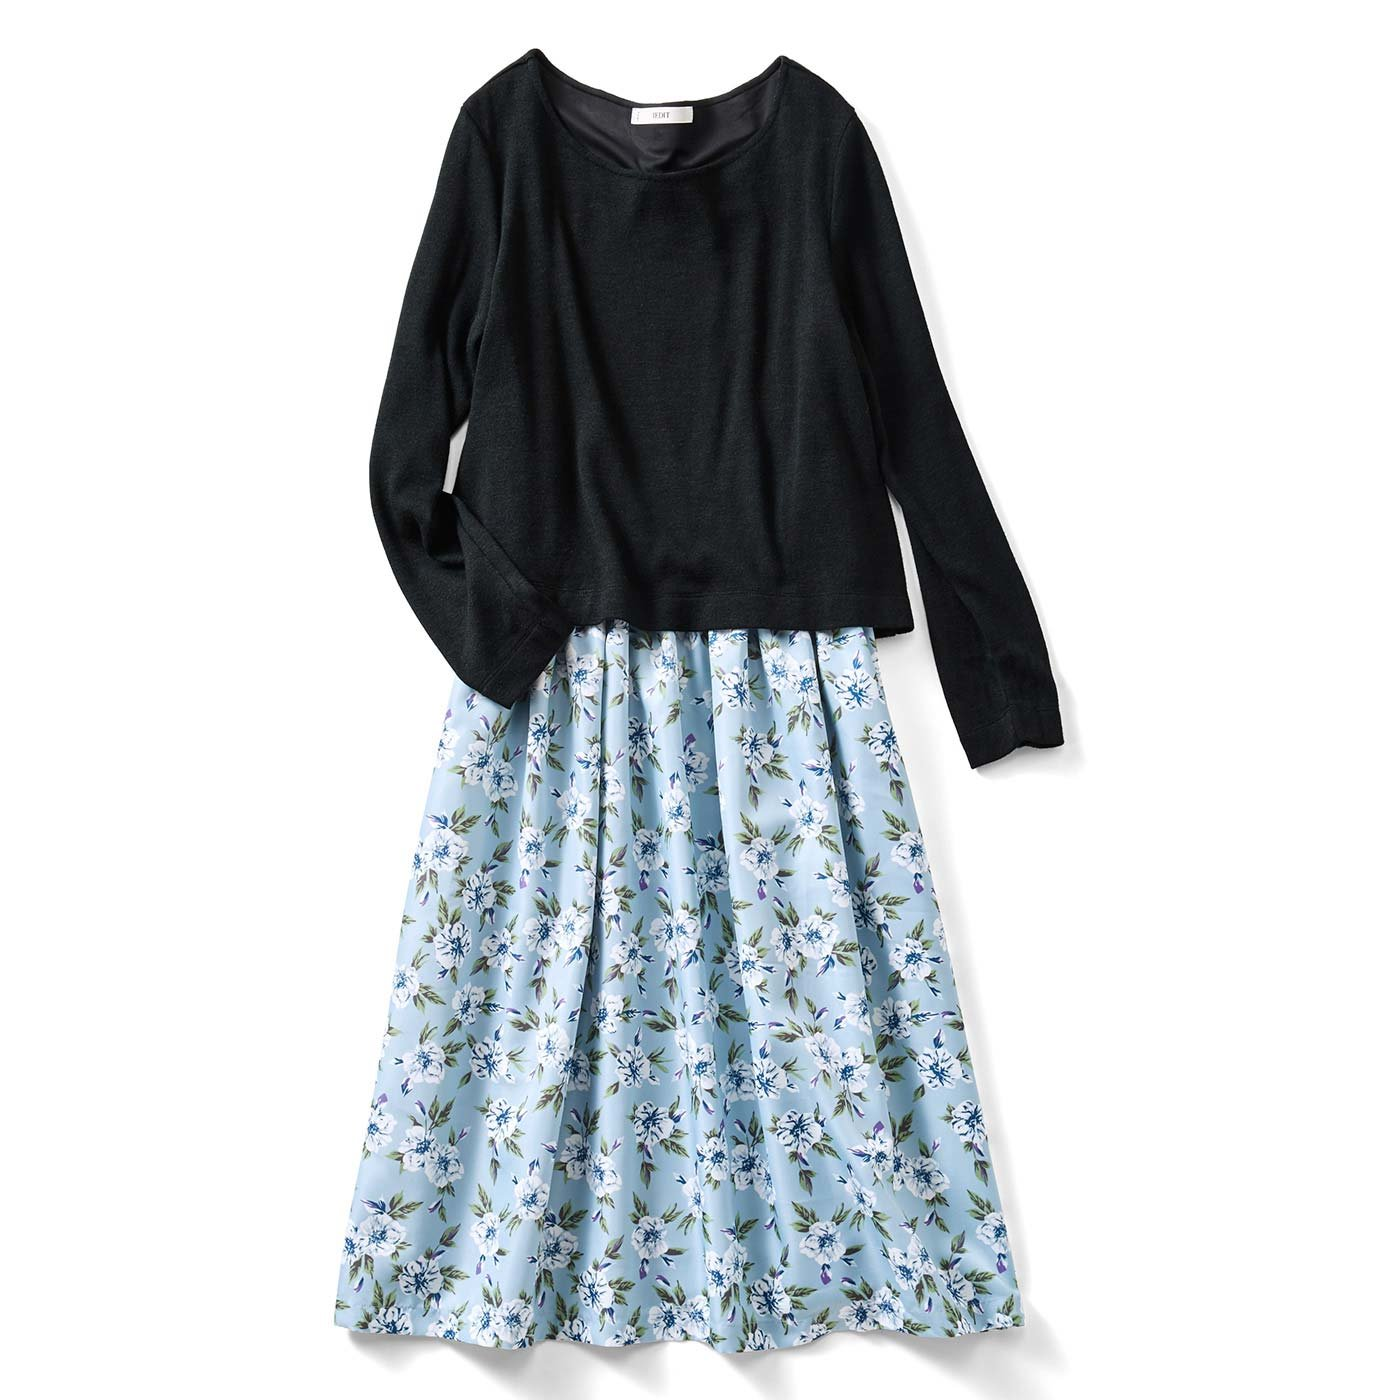 IEDIT 朝時短がかなう ふわニットと花柄のドッキングワンピース〈ブラック×ブルー〉